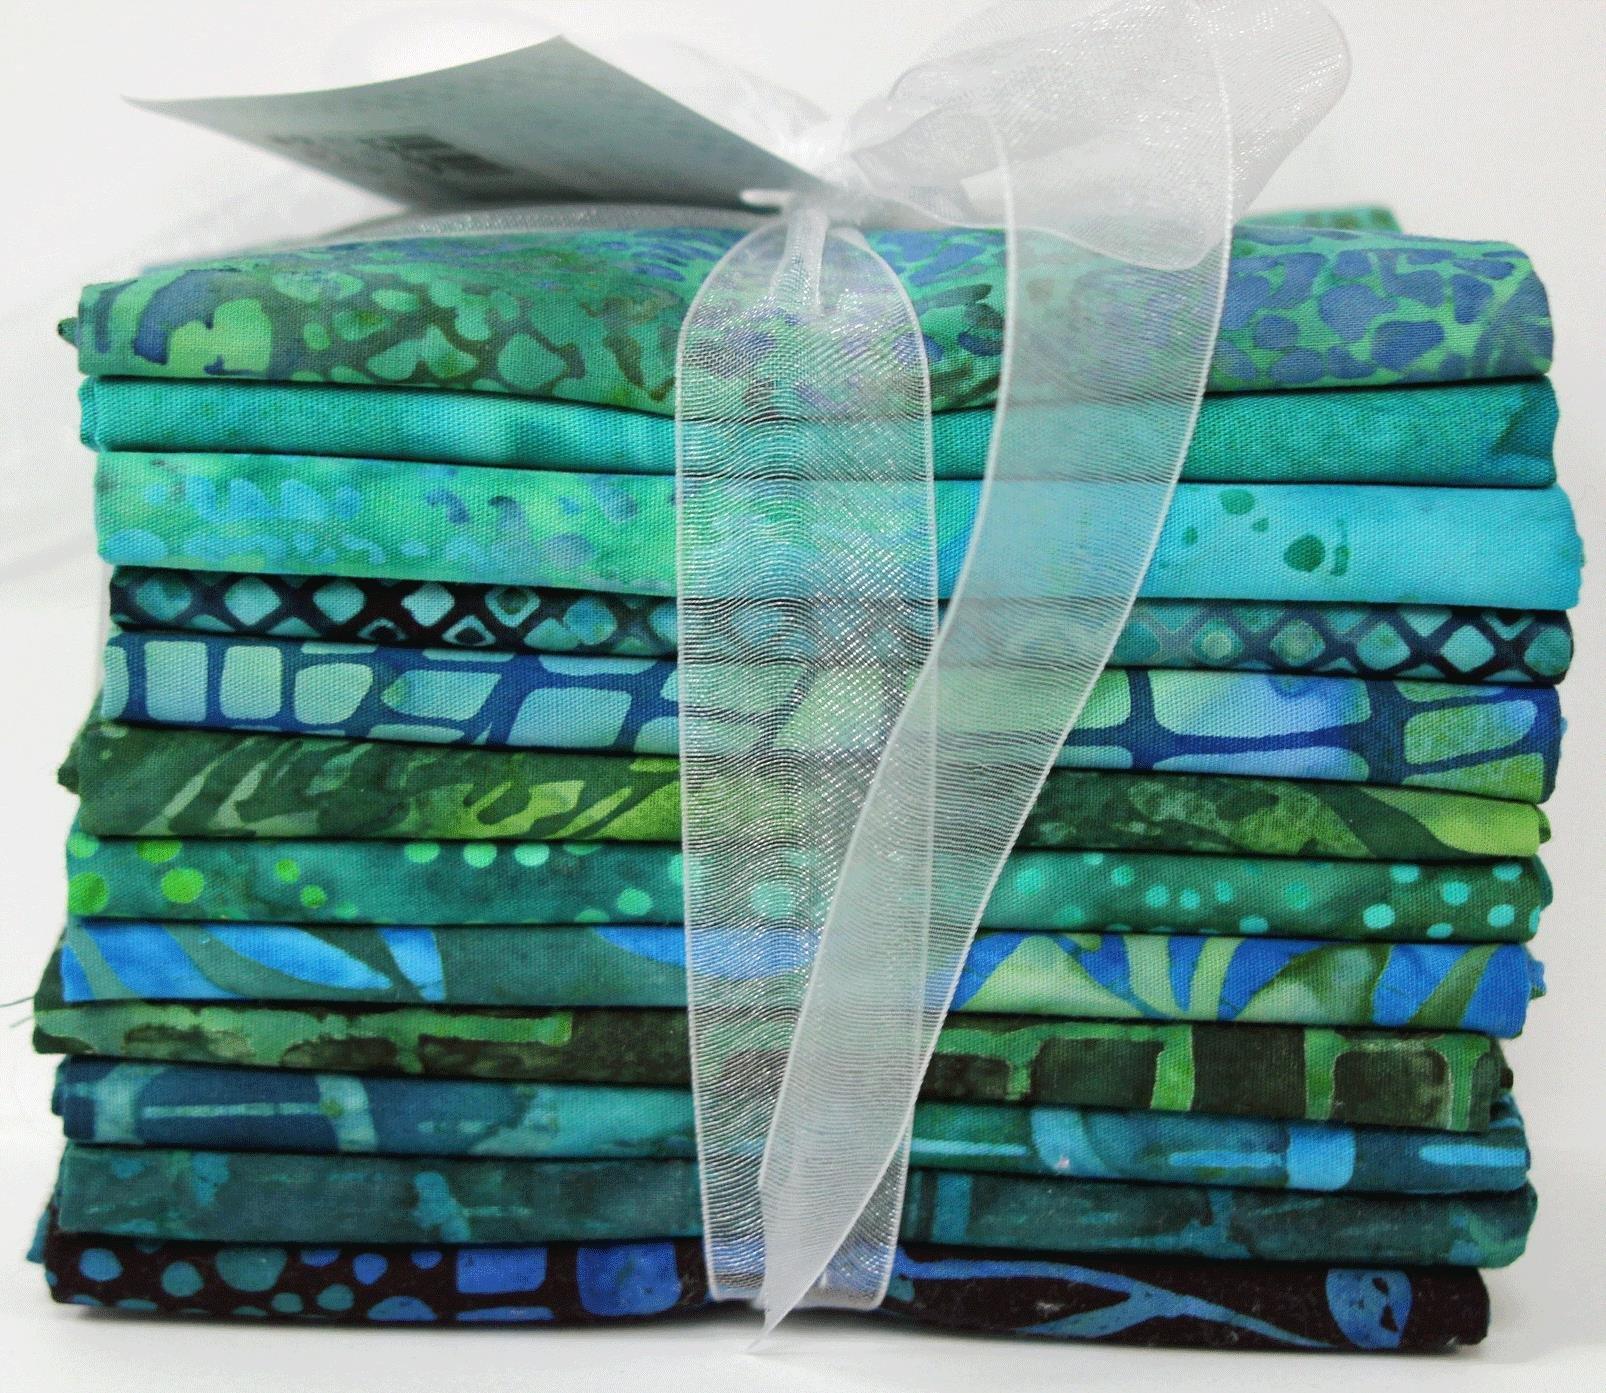 Free Fall Blue & Green Batik Fat Quarter Pack